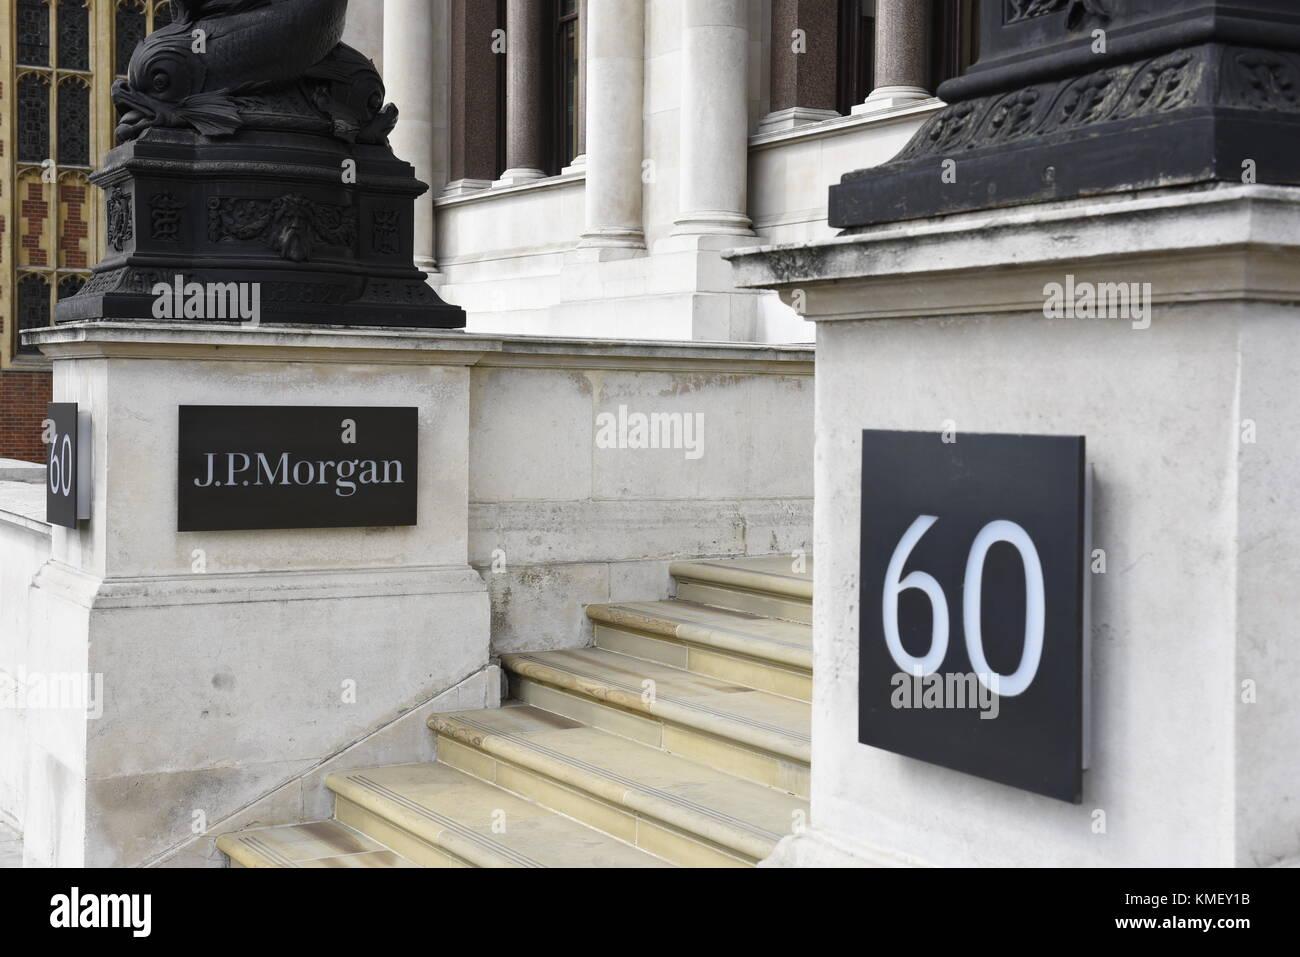 J P Morgan Co Investment Bank Headquarters 60 Victoria Stock Photo Alamy